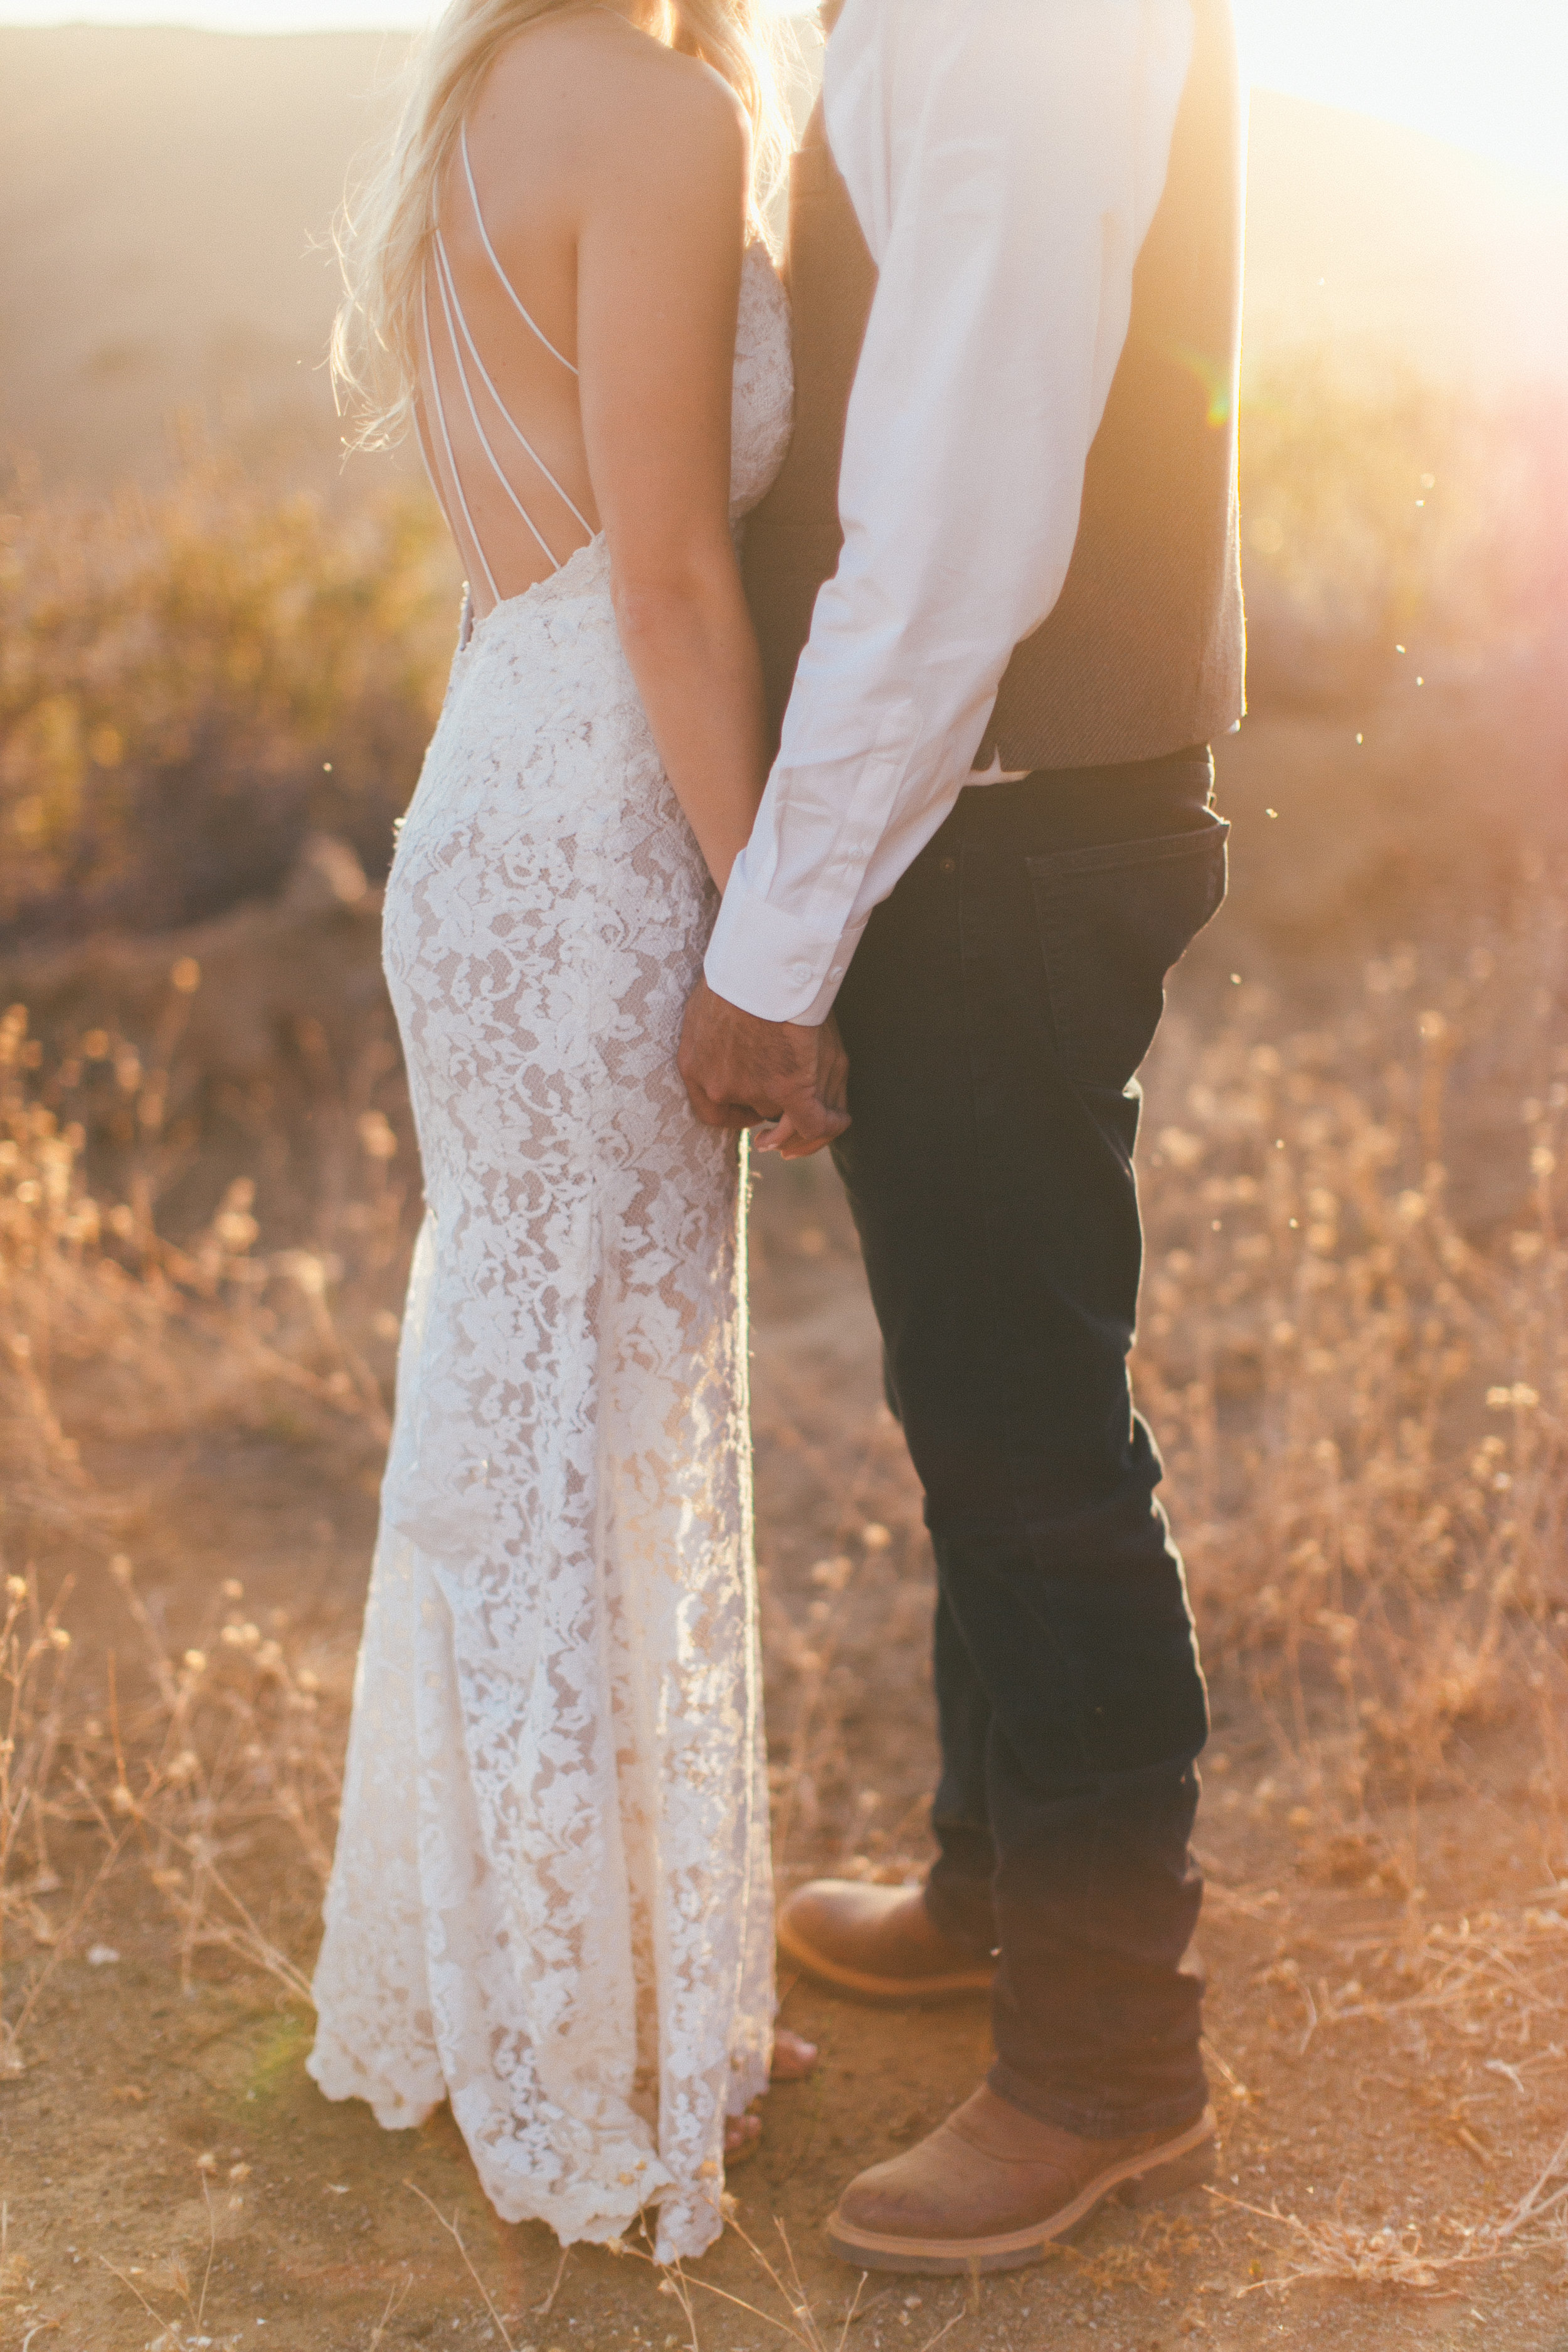 Rhianna-Mercier-Photography-Molly-Tyler-La-Questa-Ranch-Wedding-20727.jpg